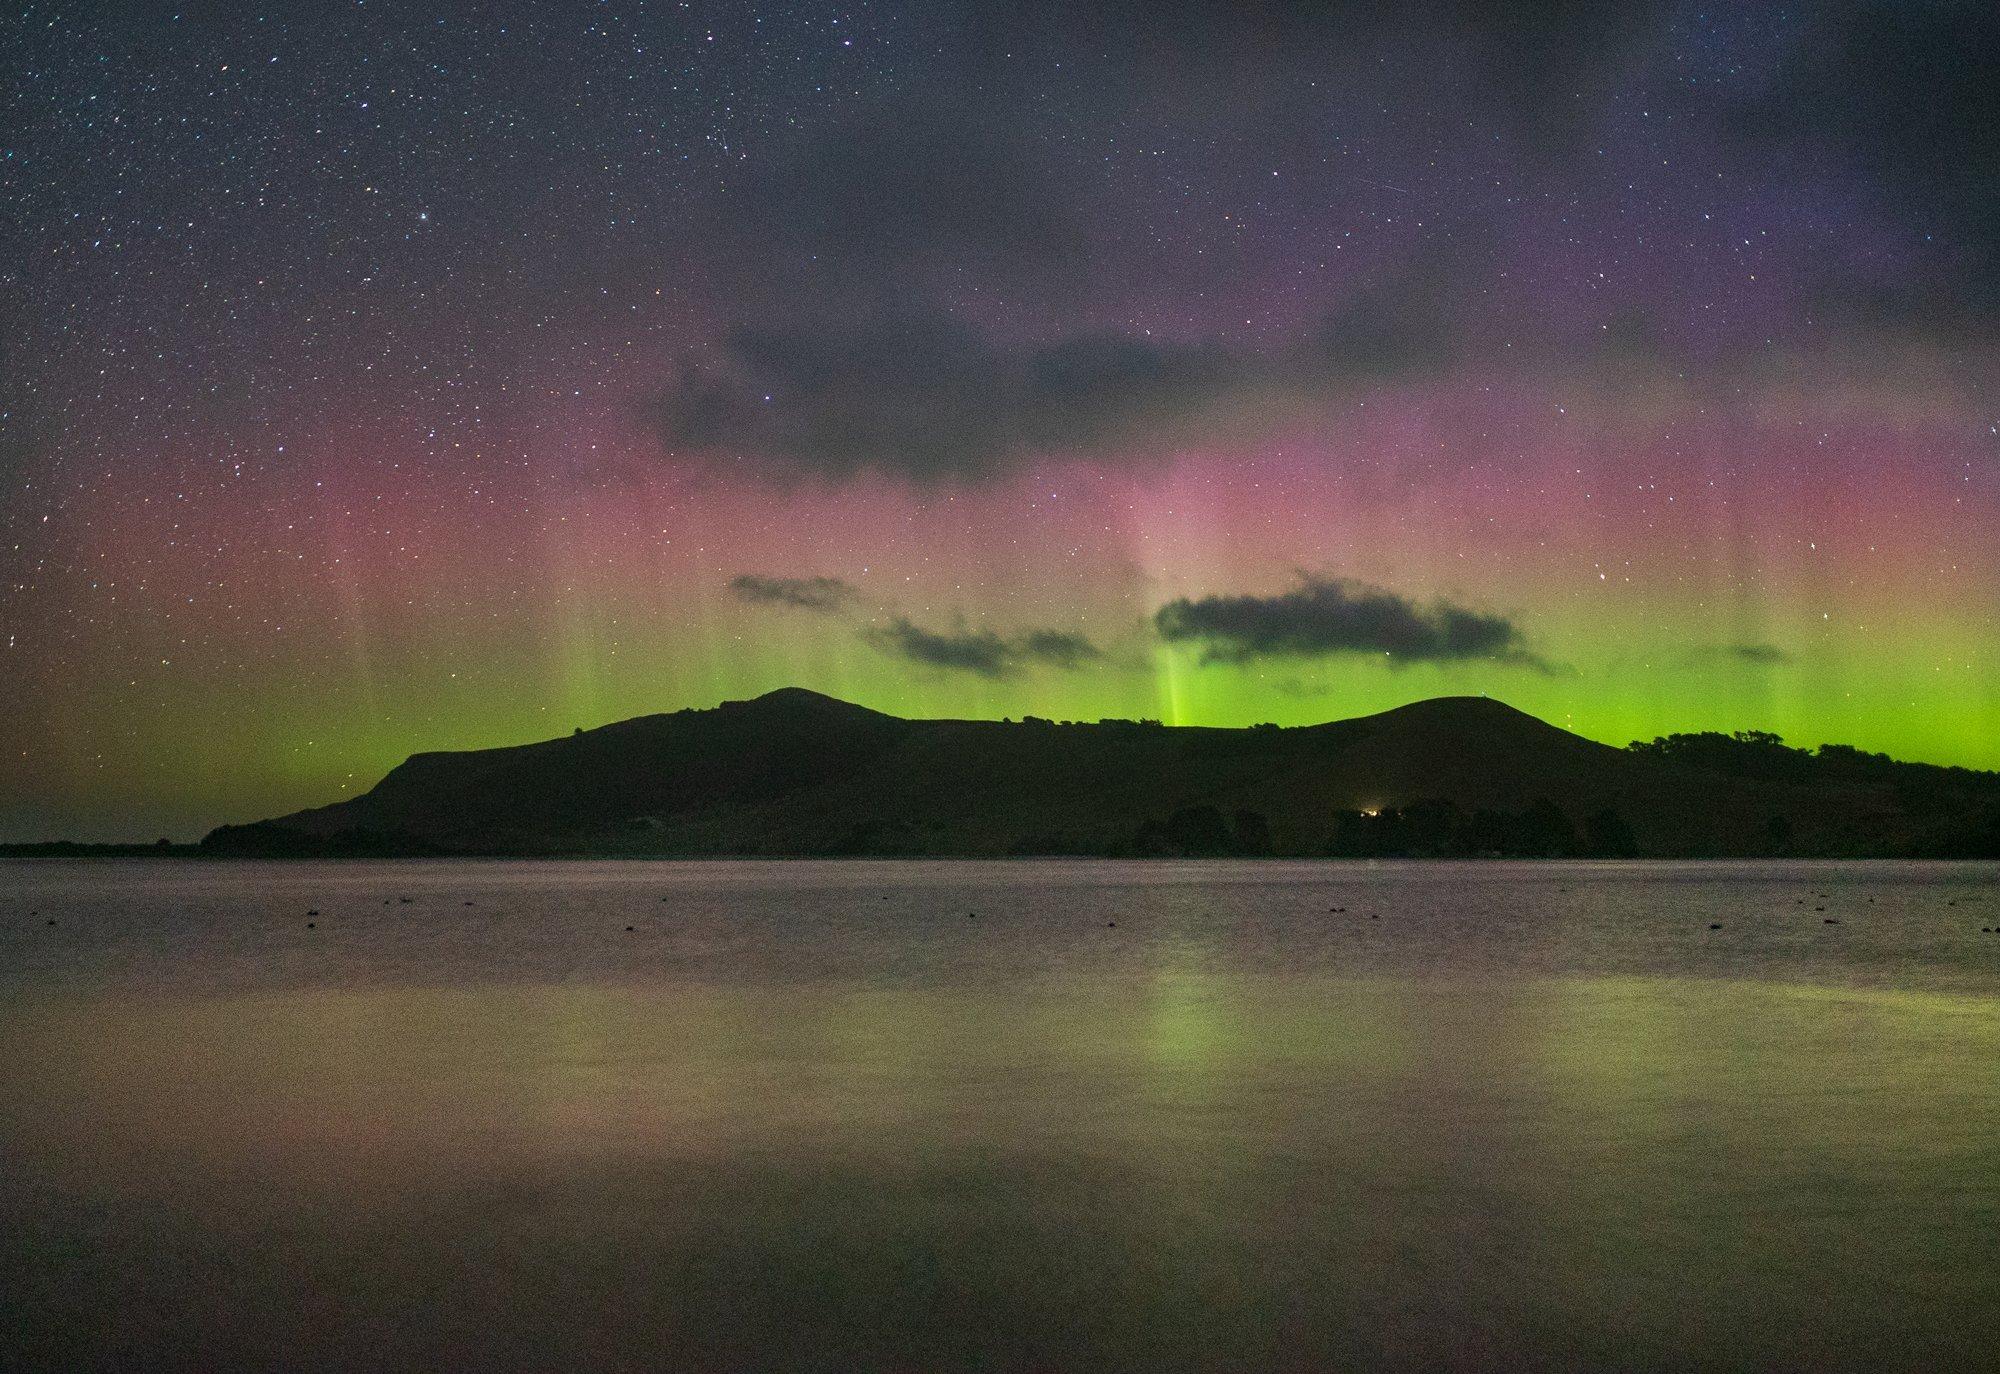 The aurora australis seen from Otago Peninsula. PHOTO: IAN GRIFFIN